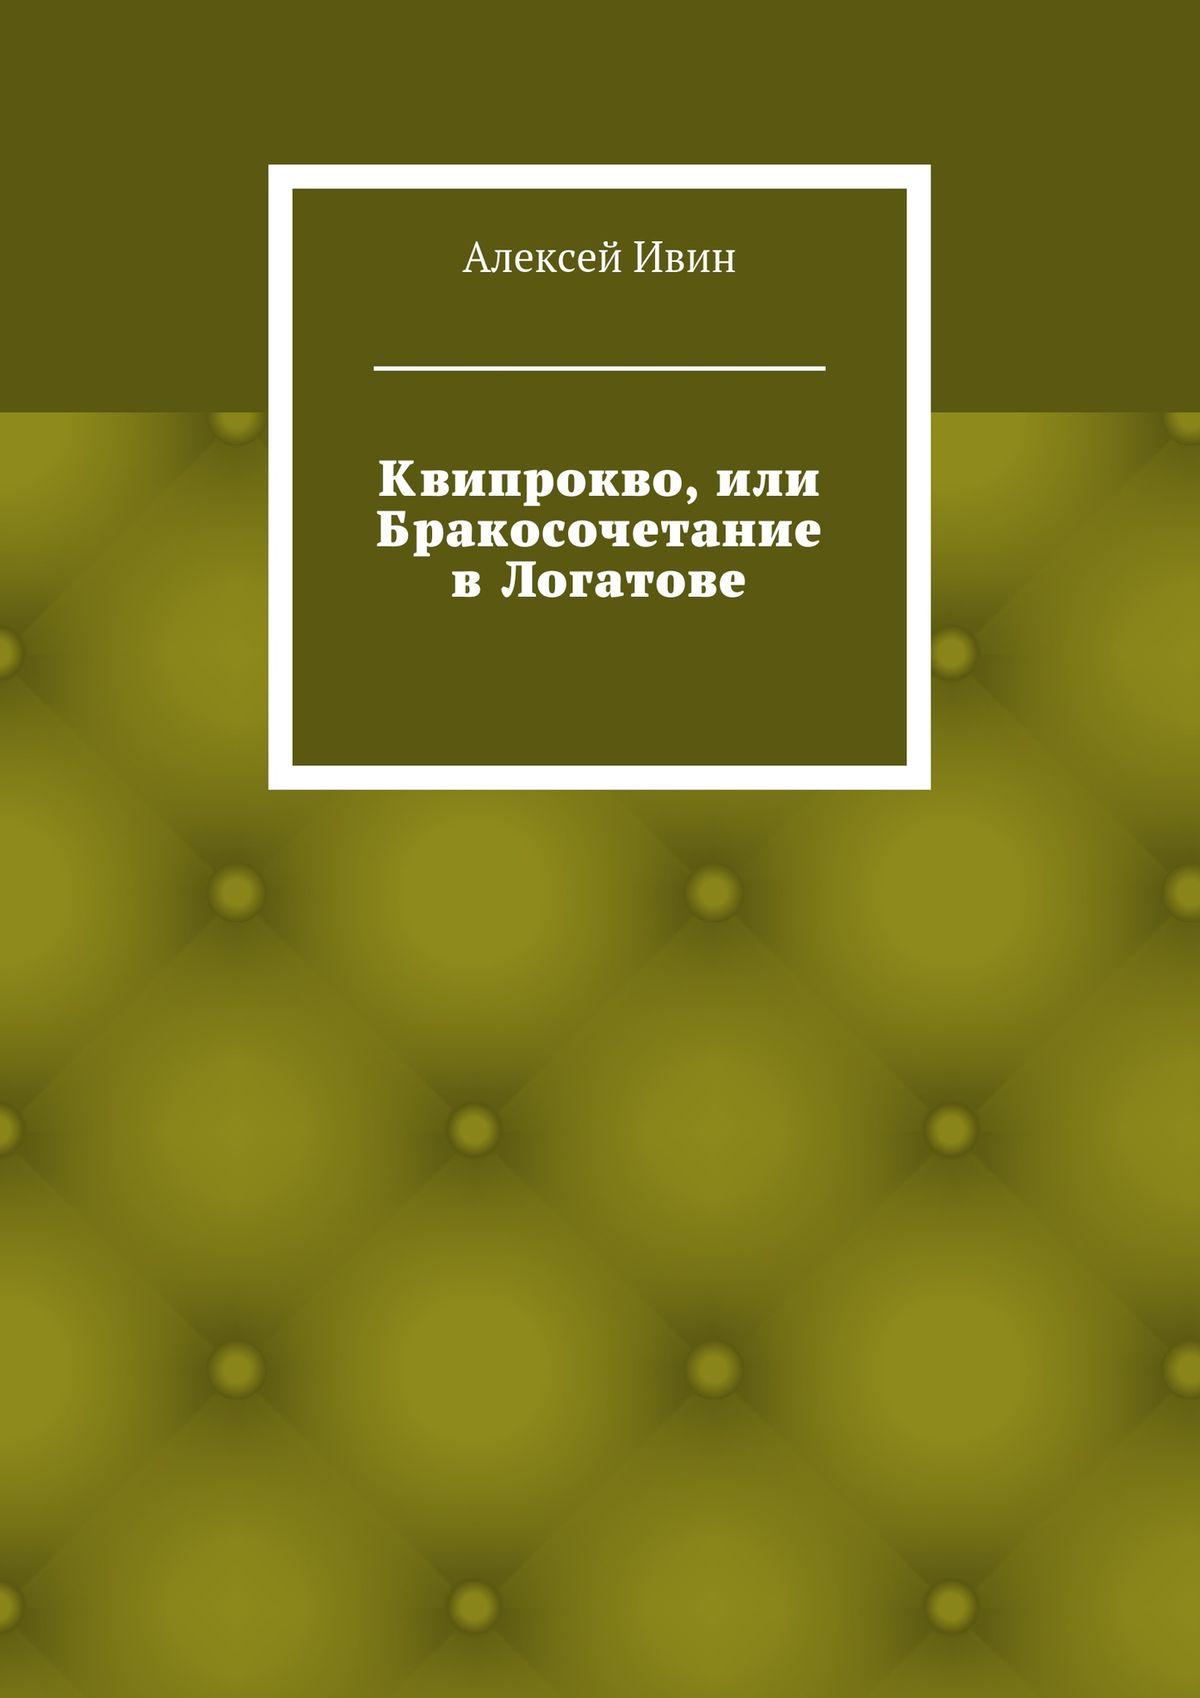 Алексей Николаевич Ивин Квипрокво, или Бракосочетание вЛогатове